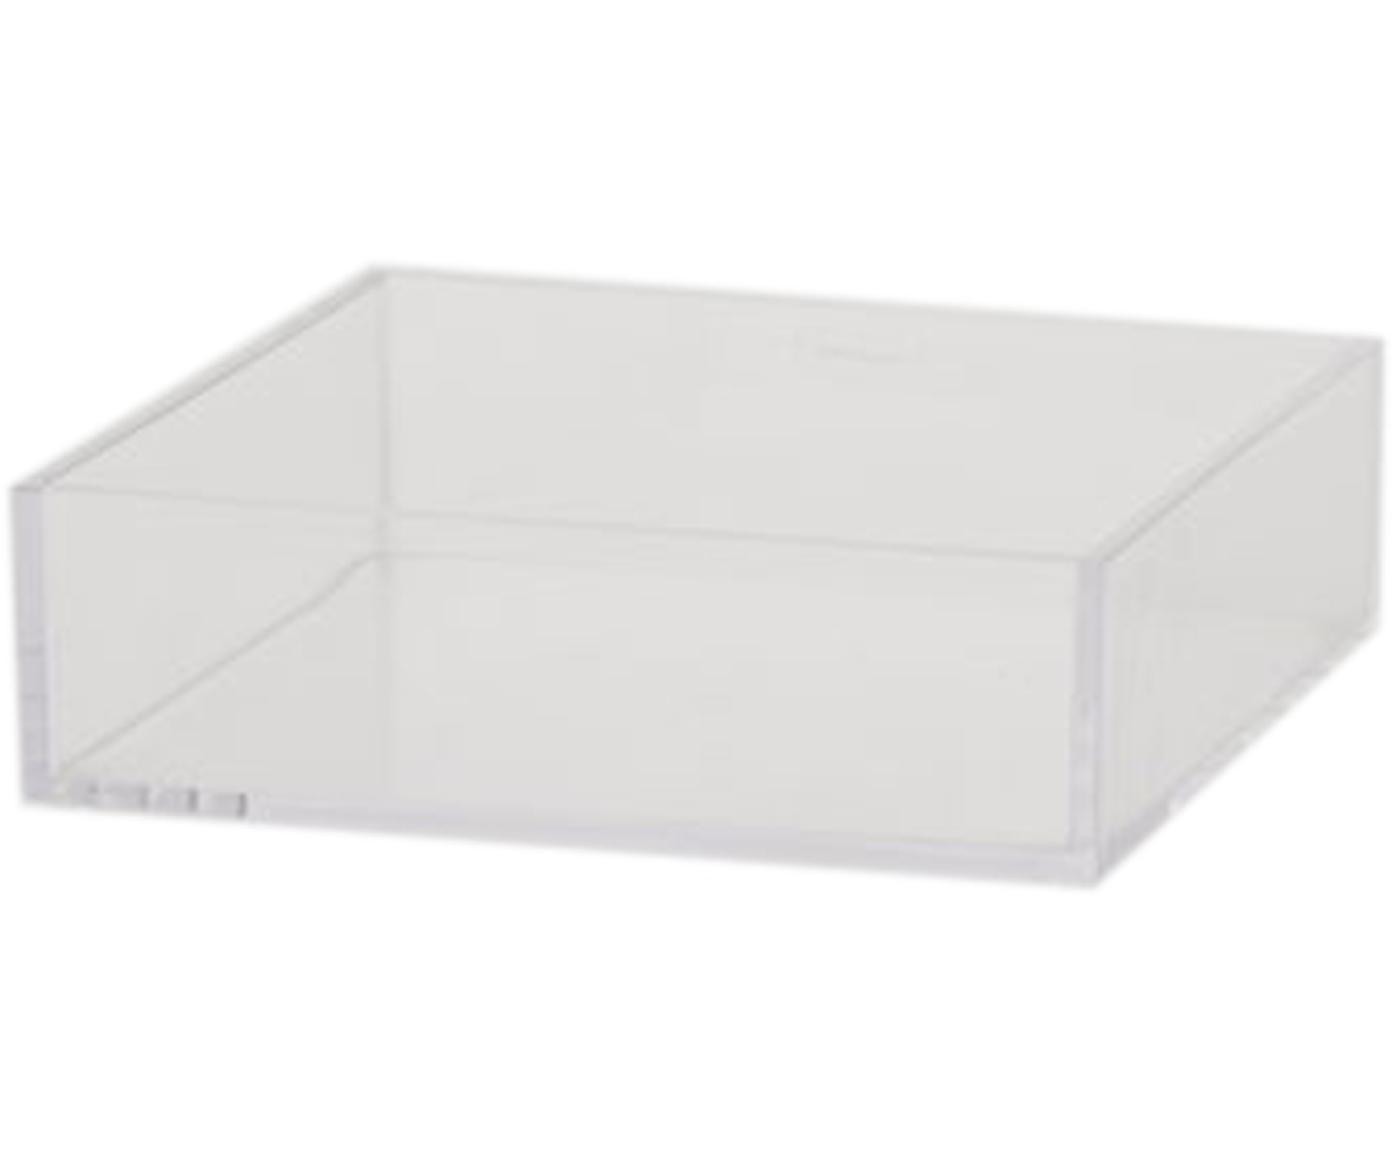 Vassoio Clear, Acrilico, Trasparente, Larg. 16 x Lung. 16 cm